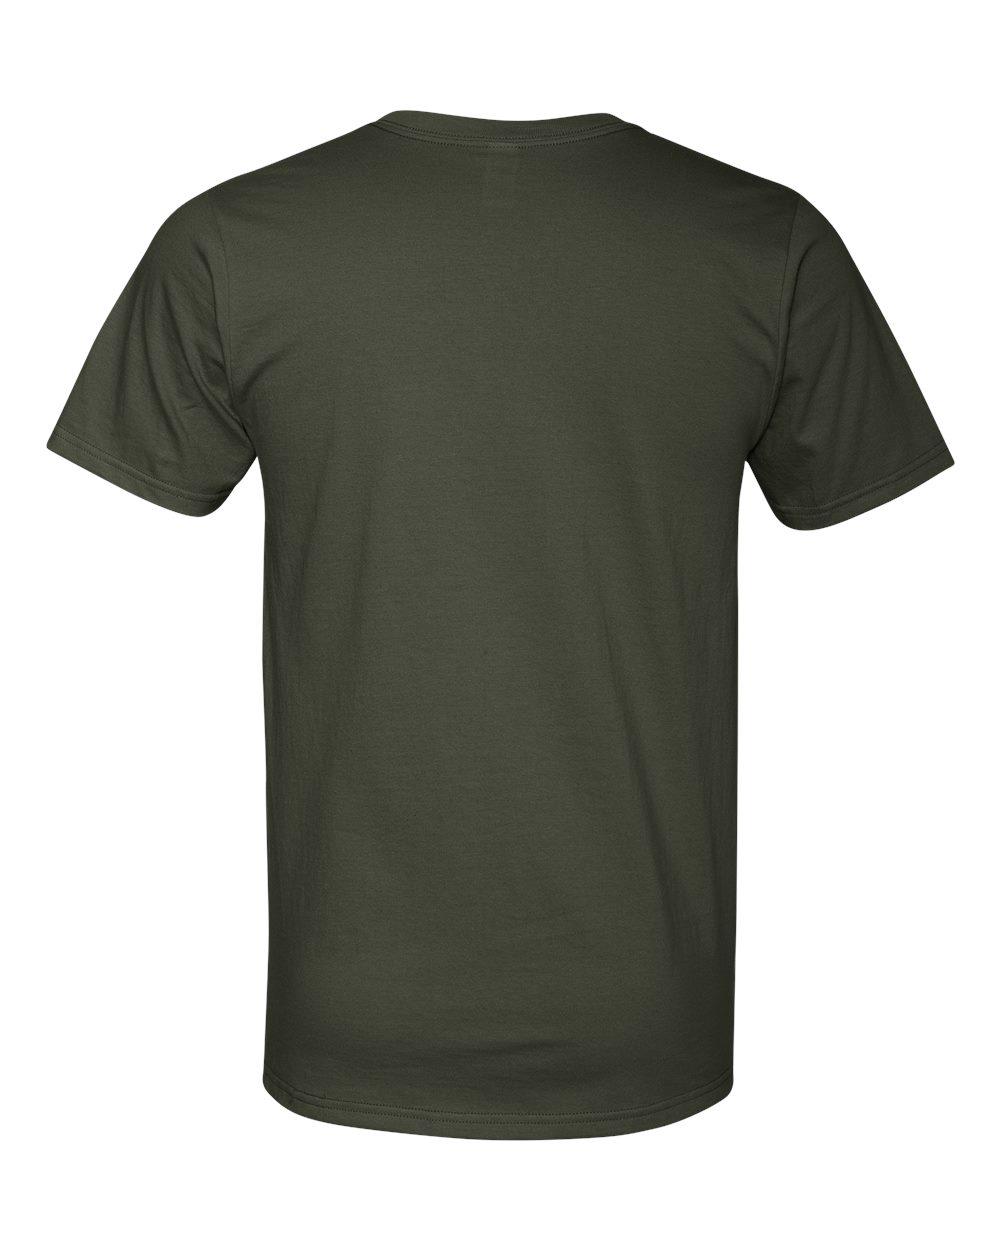 Anvil-Men-039-s-Lightweight-V-Neck-T-Shirt-982-S-3XL thumbnail 10